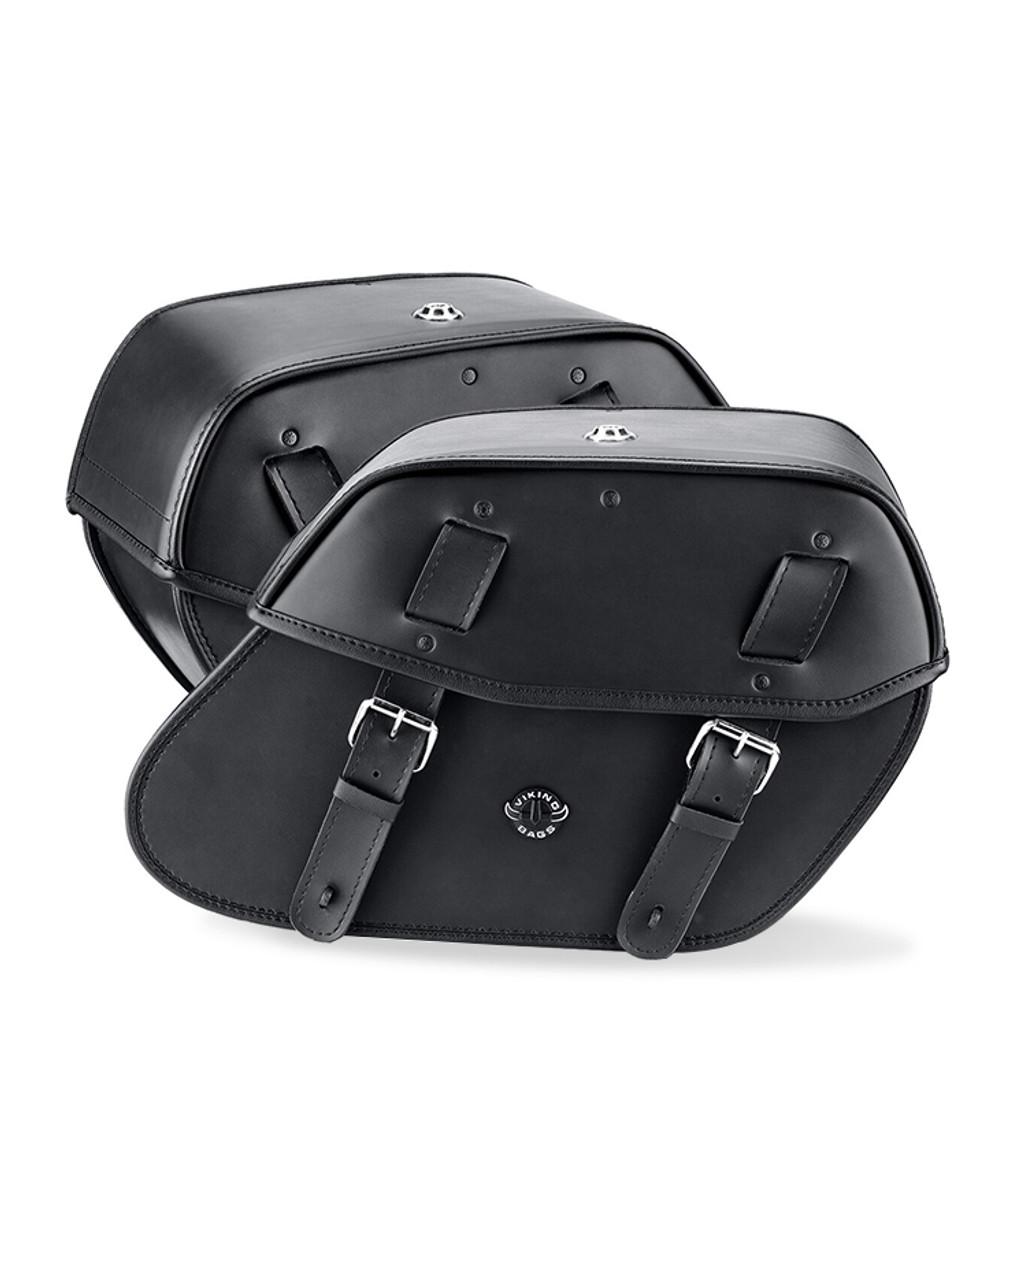 VikingBags Odin Medium Double Strap Honda Shadow Aero ABS VT750CS Leather Motorcycle Saddlebags Both Bags View